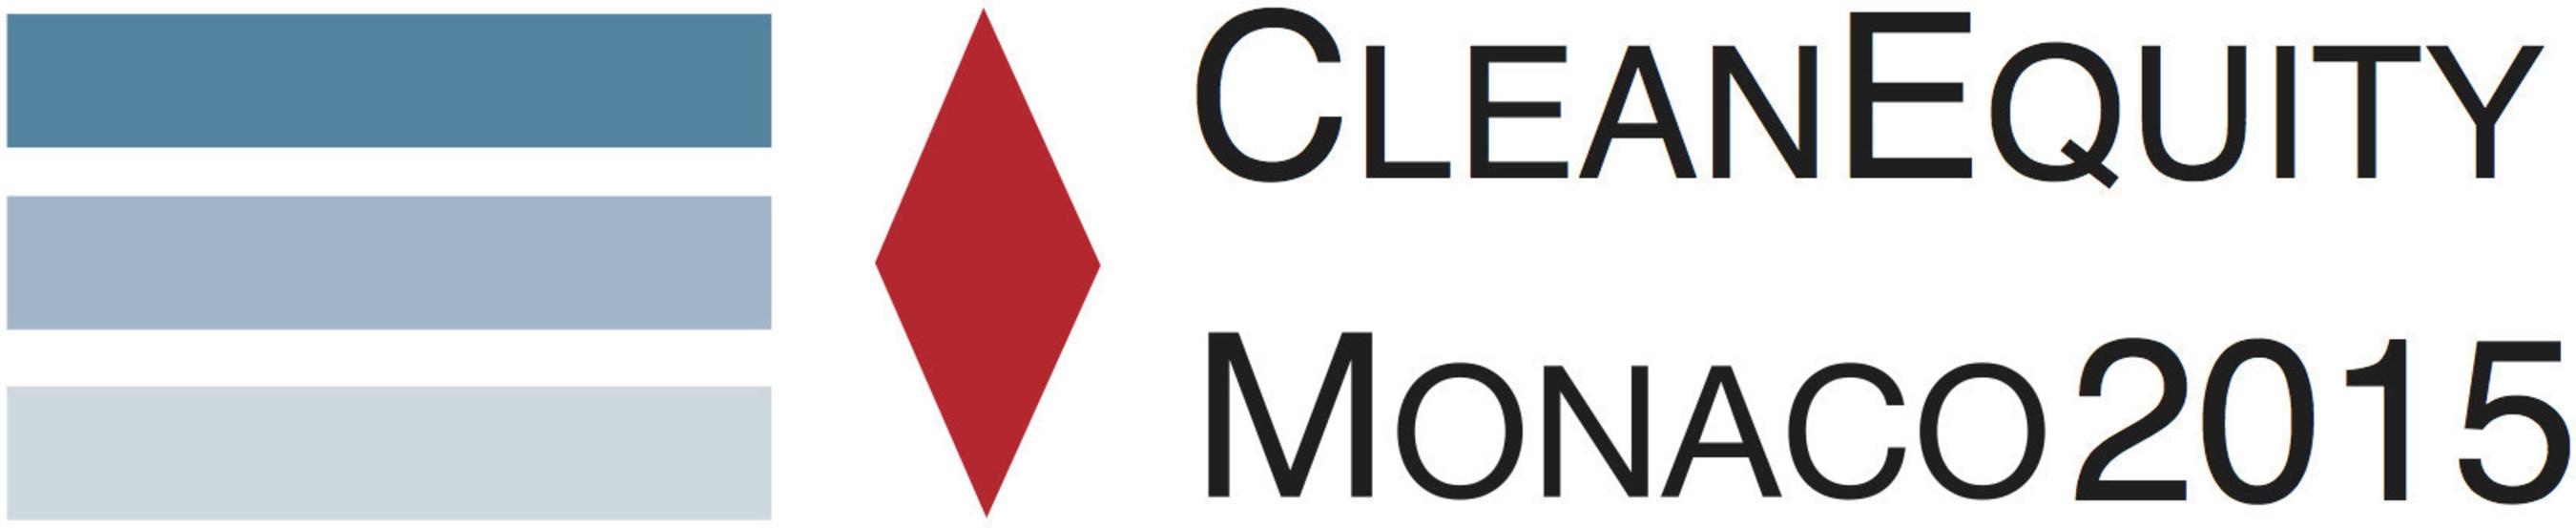 CleanEquity® Monaco 2015 - Объявляем Поиск Участников и Компаний